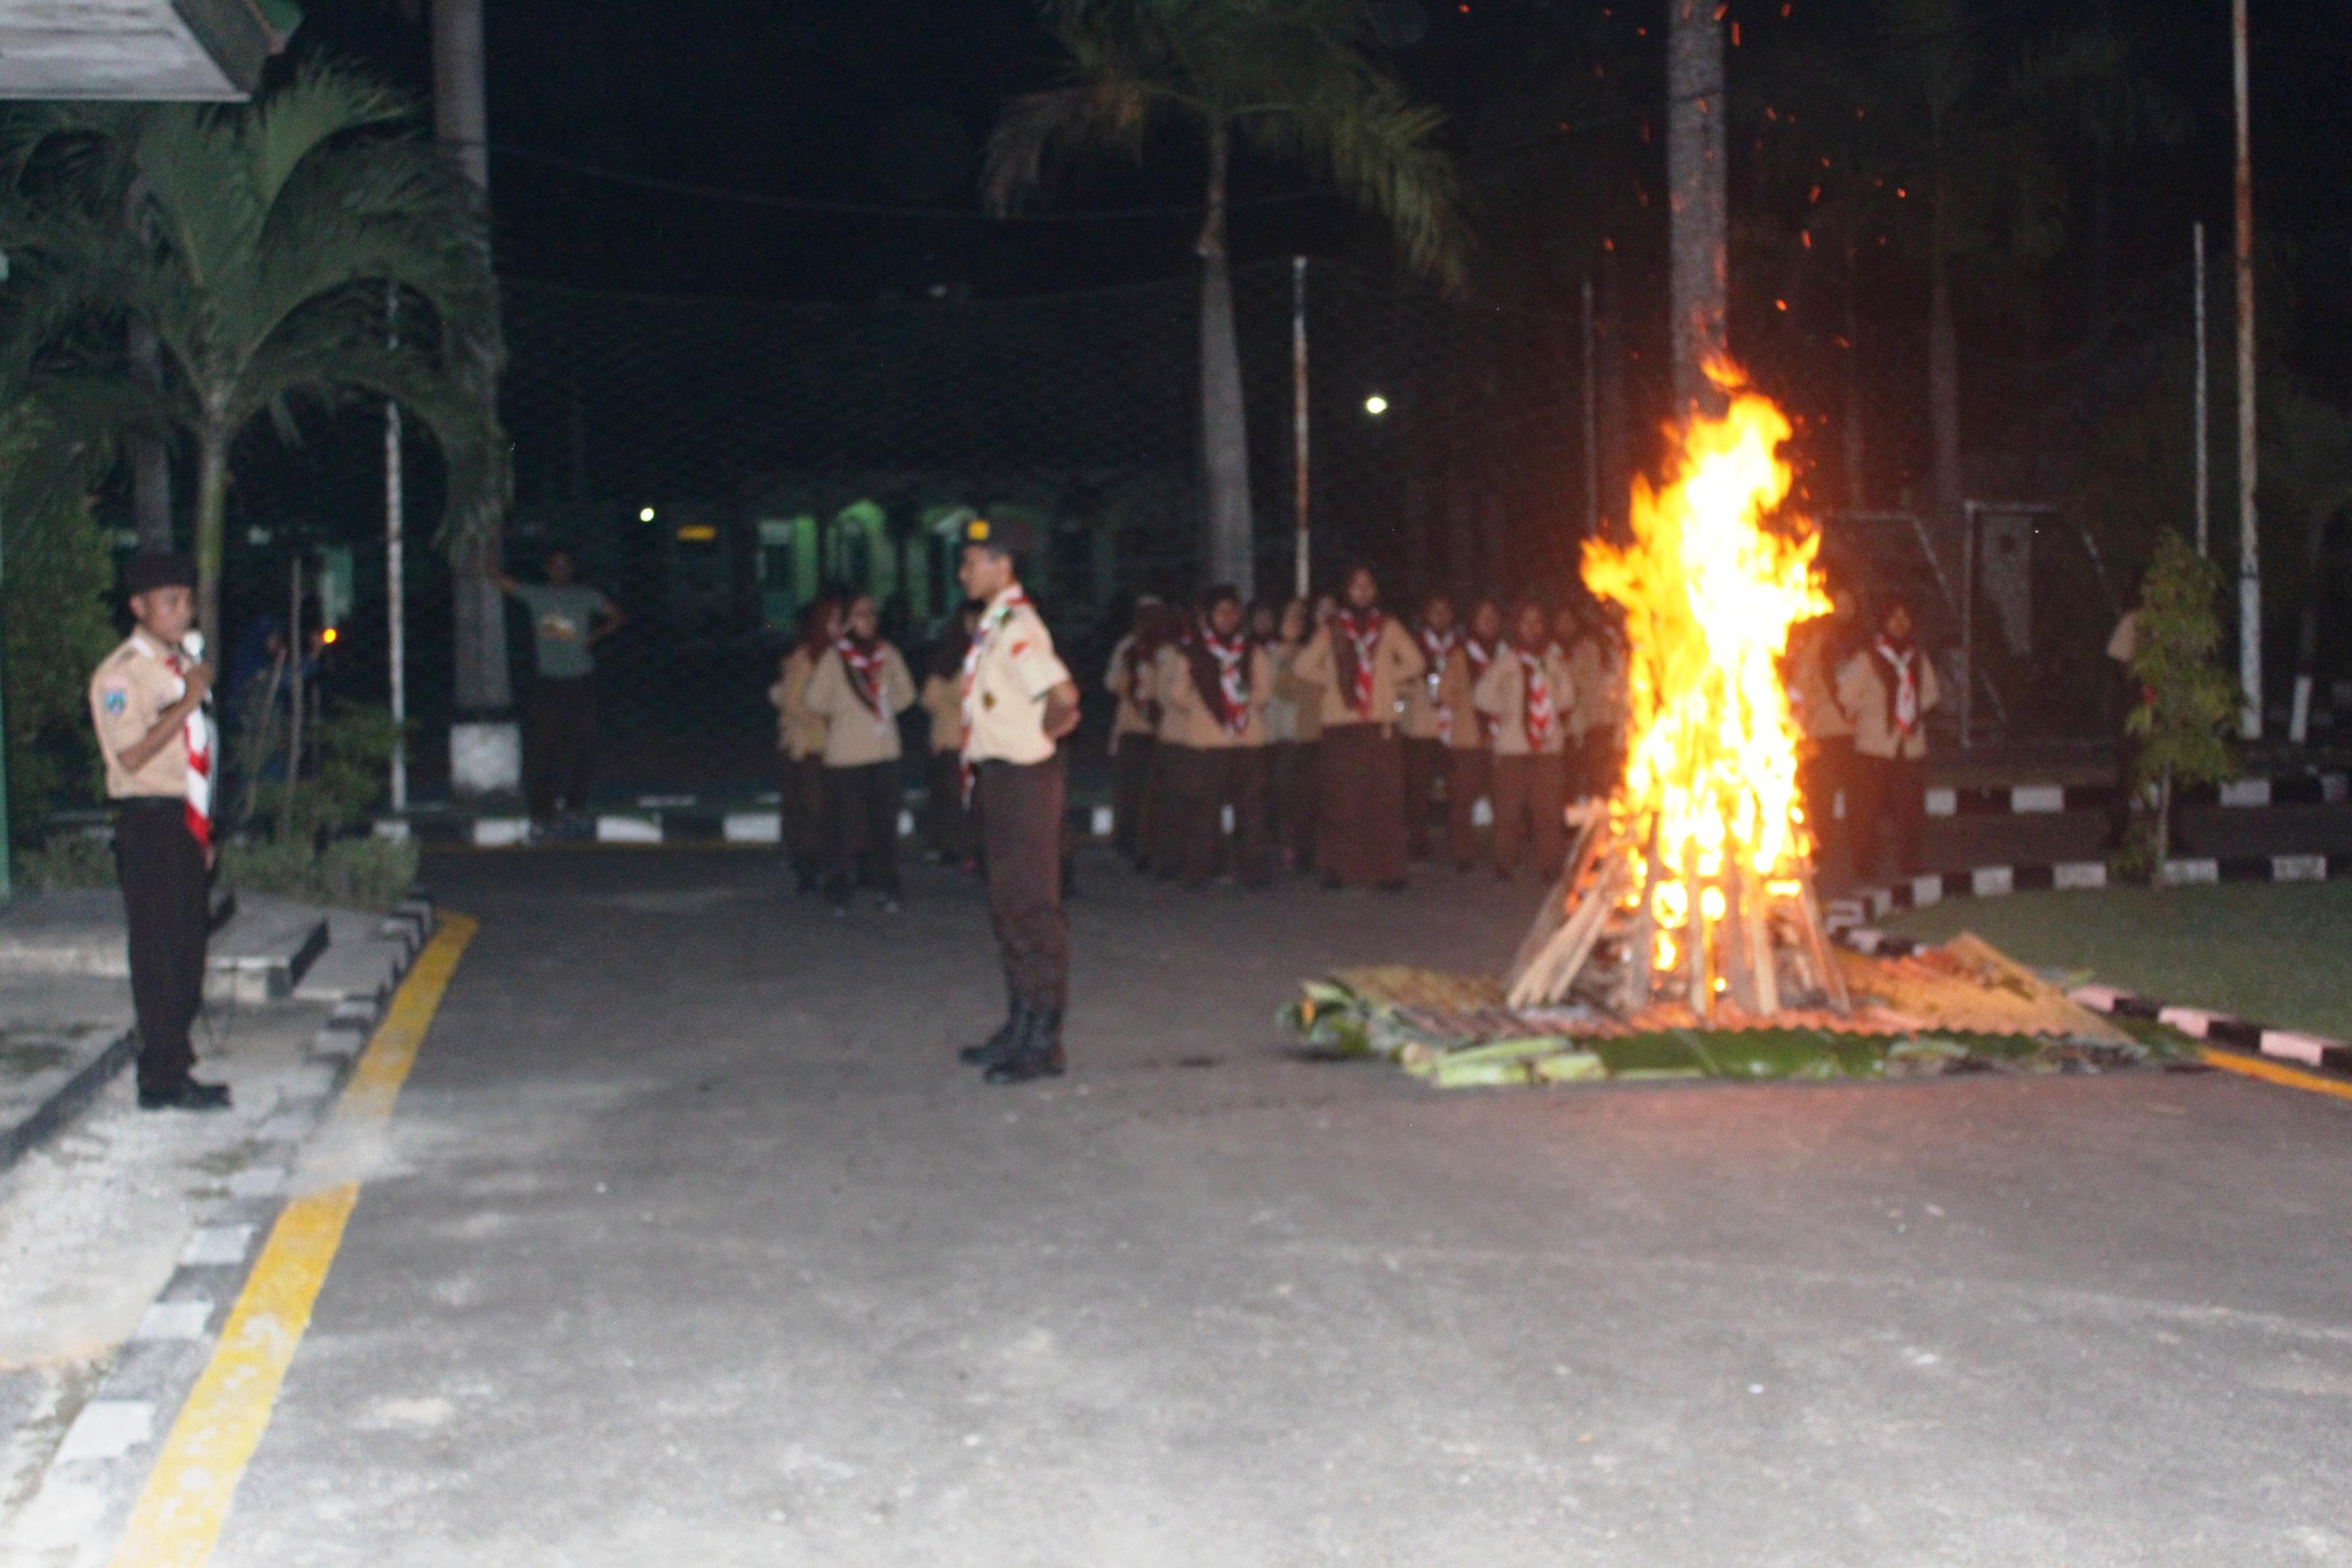 Malam Api Unggun & Pensi Perkemahan Lokakarya Pramuka Saka Wira Kartika Kodim Bojonegoro oleh Mas Pen Kompasiana